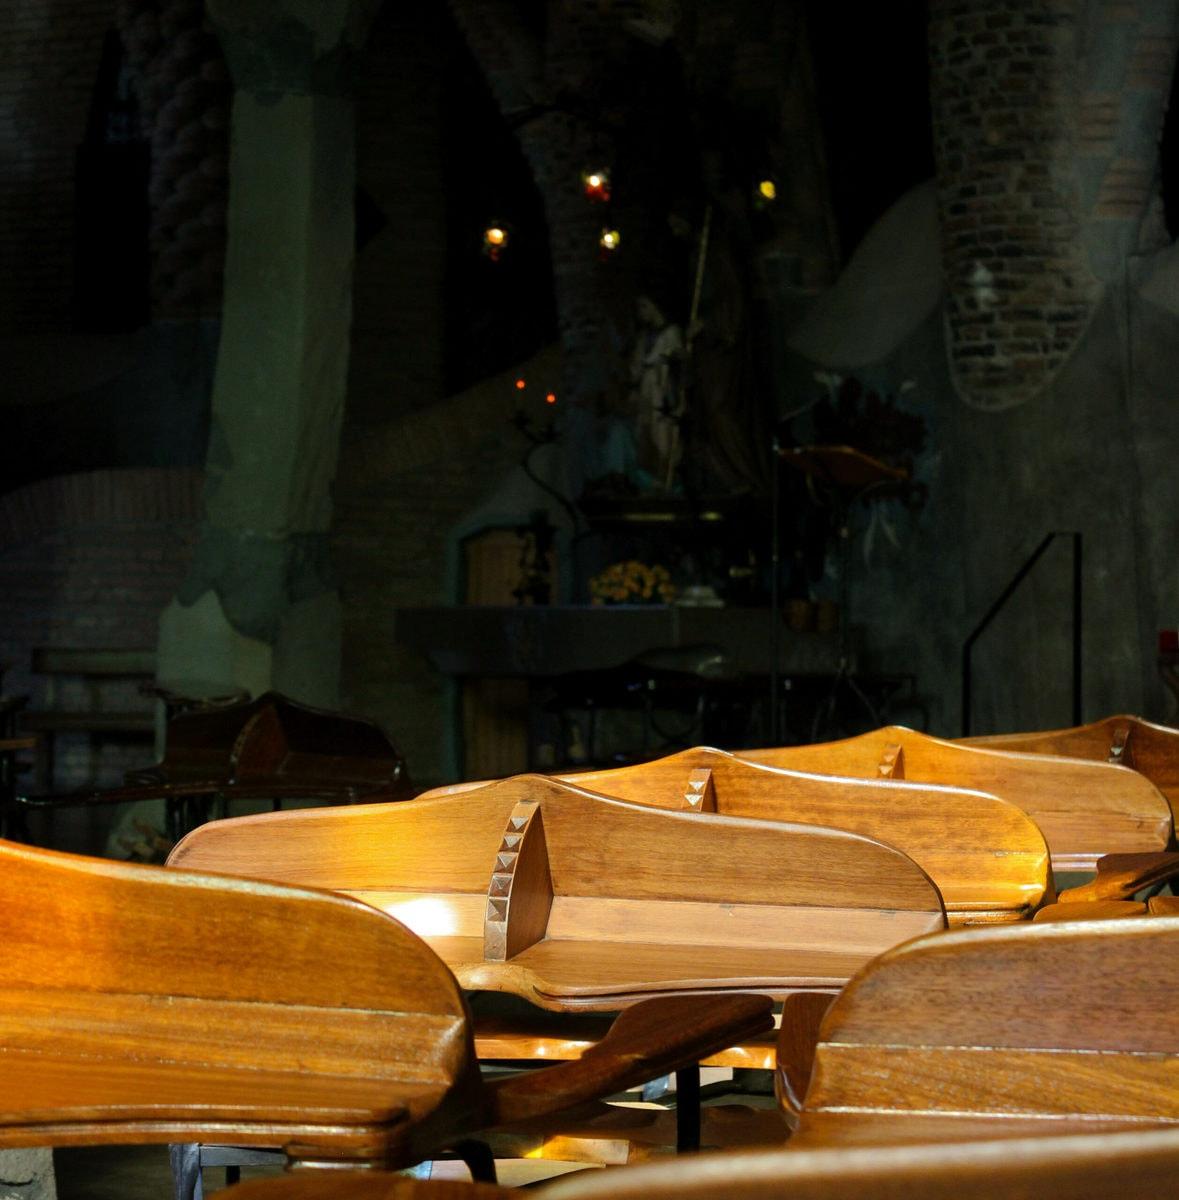 Modernistische Kirchenbänke in der Cripta Gaudi, Barcelona